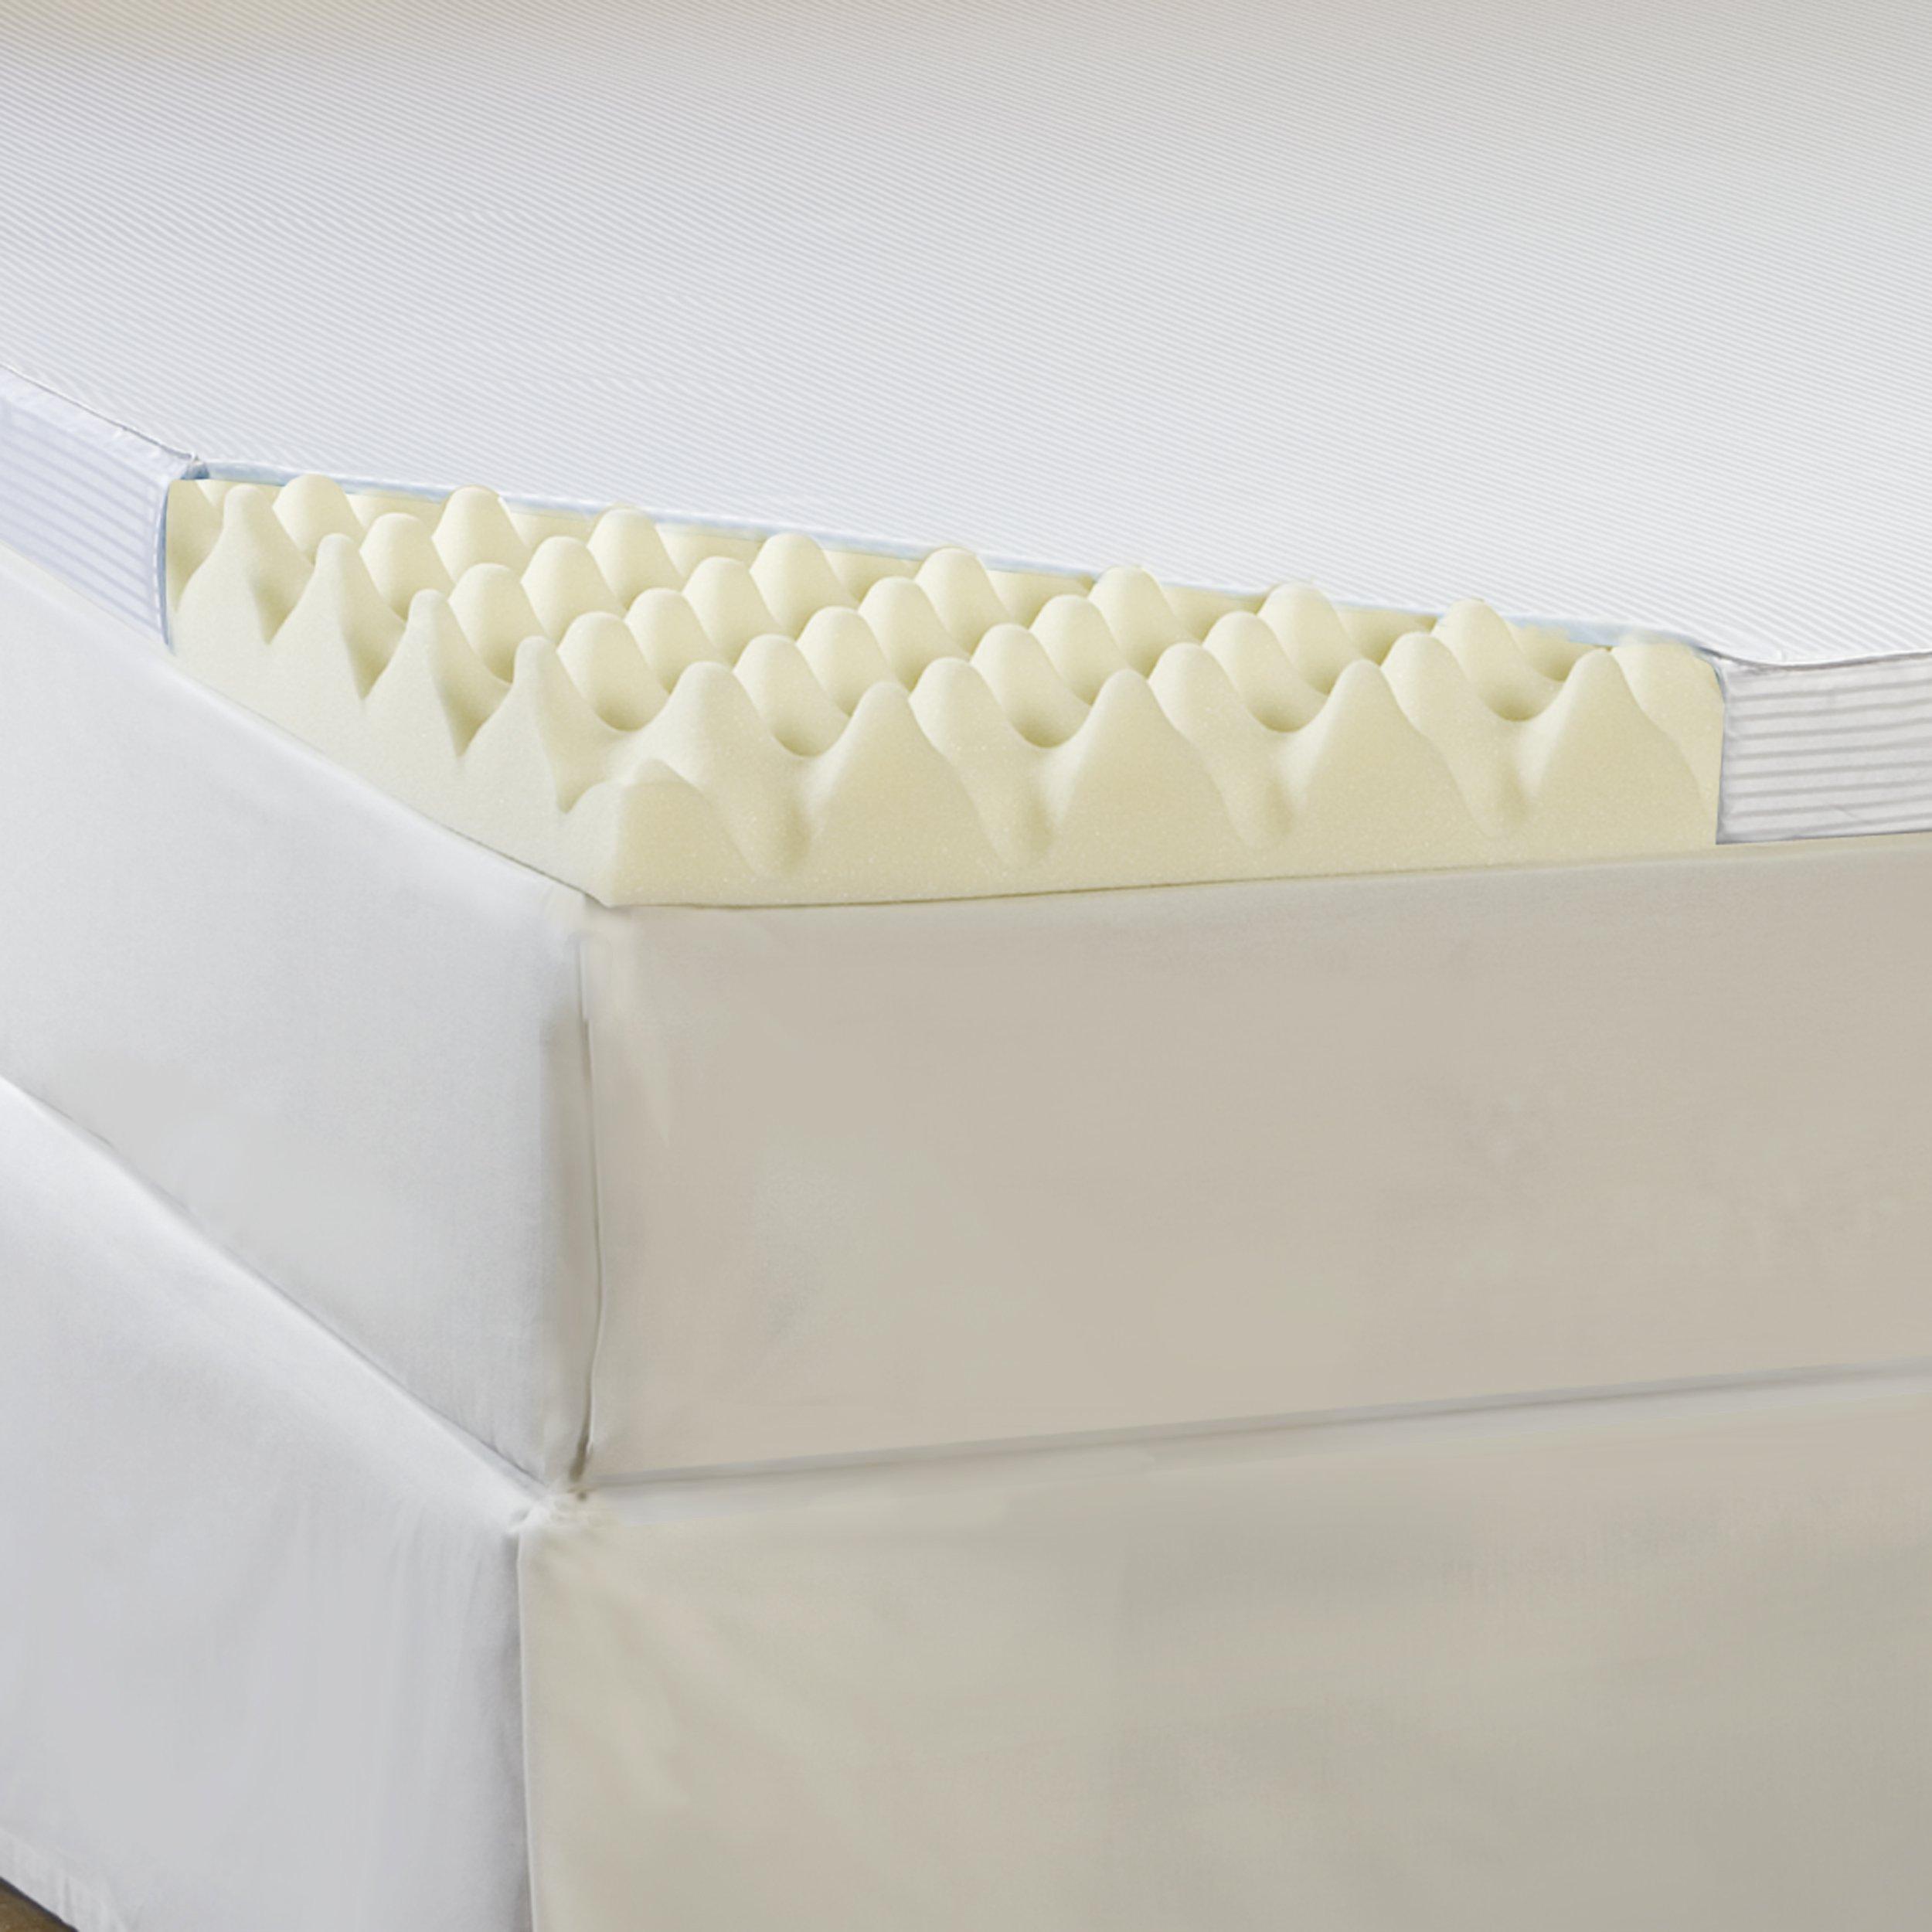 Hotel Comfort 3-Inch Big Comfort Memory Foam Topper with Polysilk Cover, Full